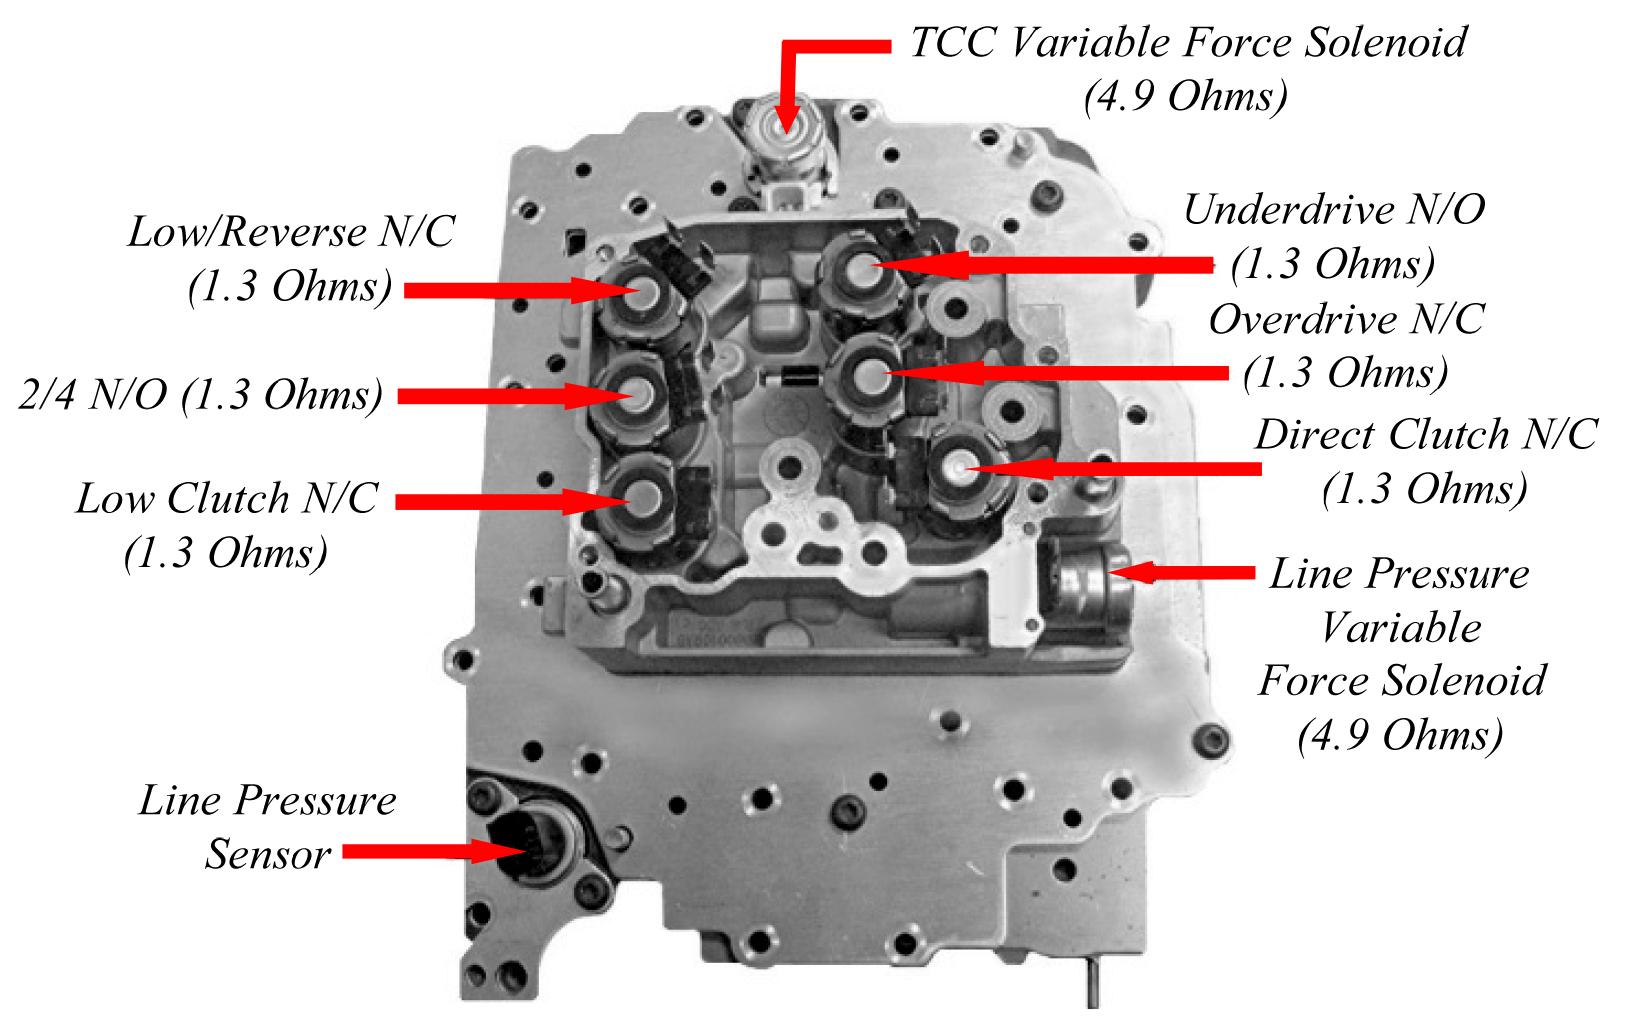 2007 chrysler sebring starter wiring diagram neutrik xlr transmission free sonnax 62te solenoid identification connector pin out parts 2006 diagrams